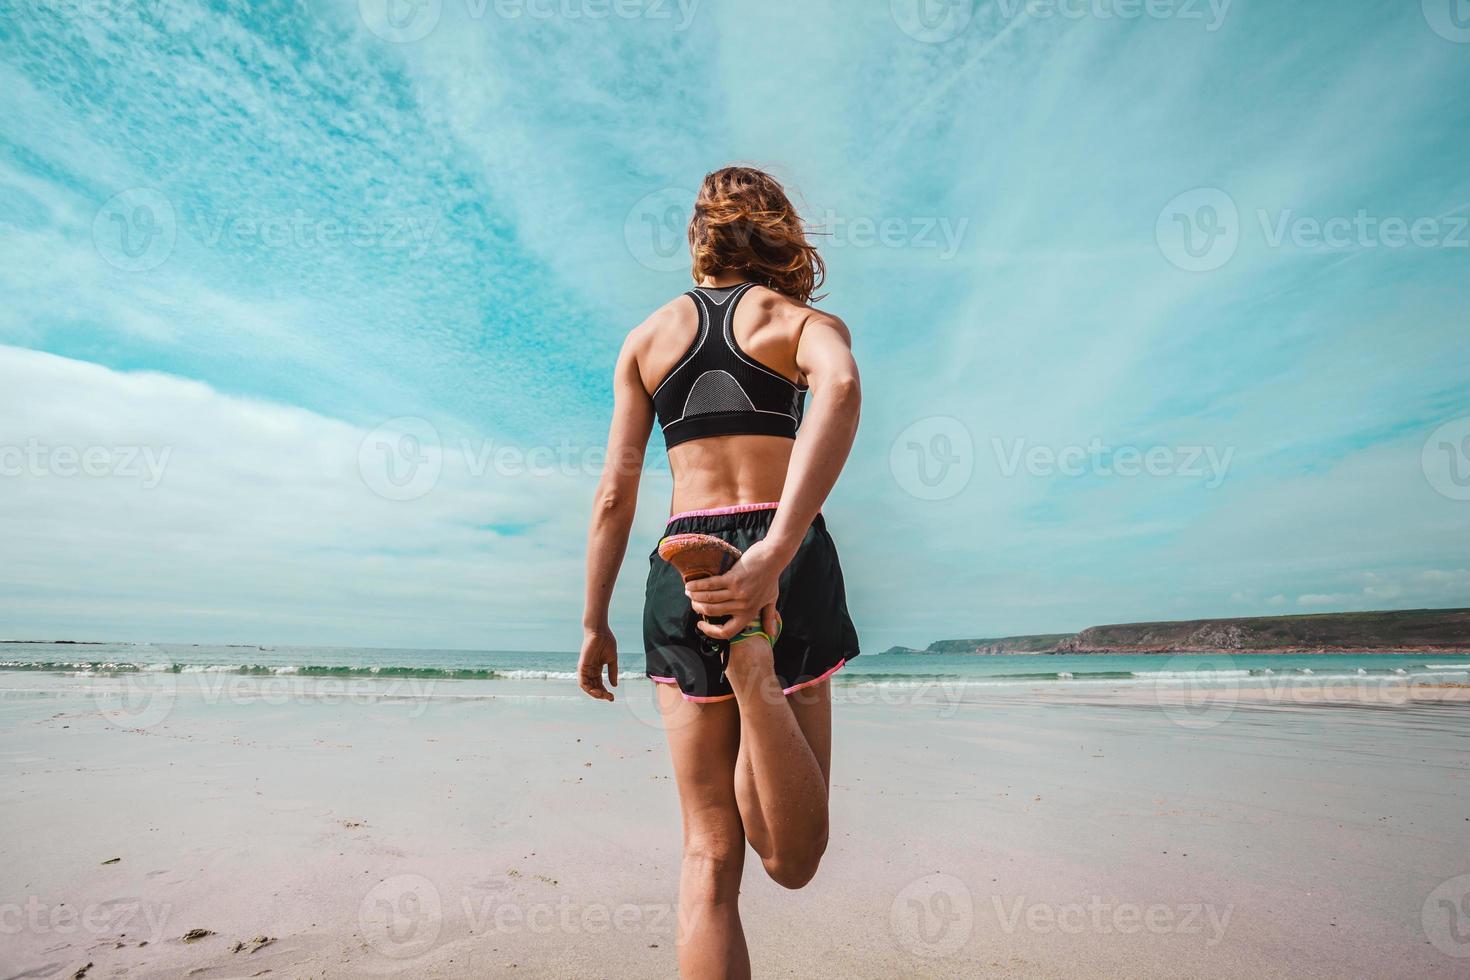 atletisk ung kvinna som sträcker sig på stranden foto